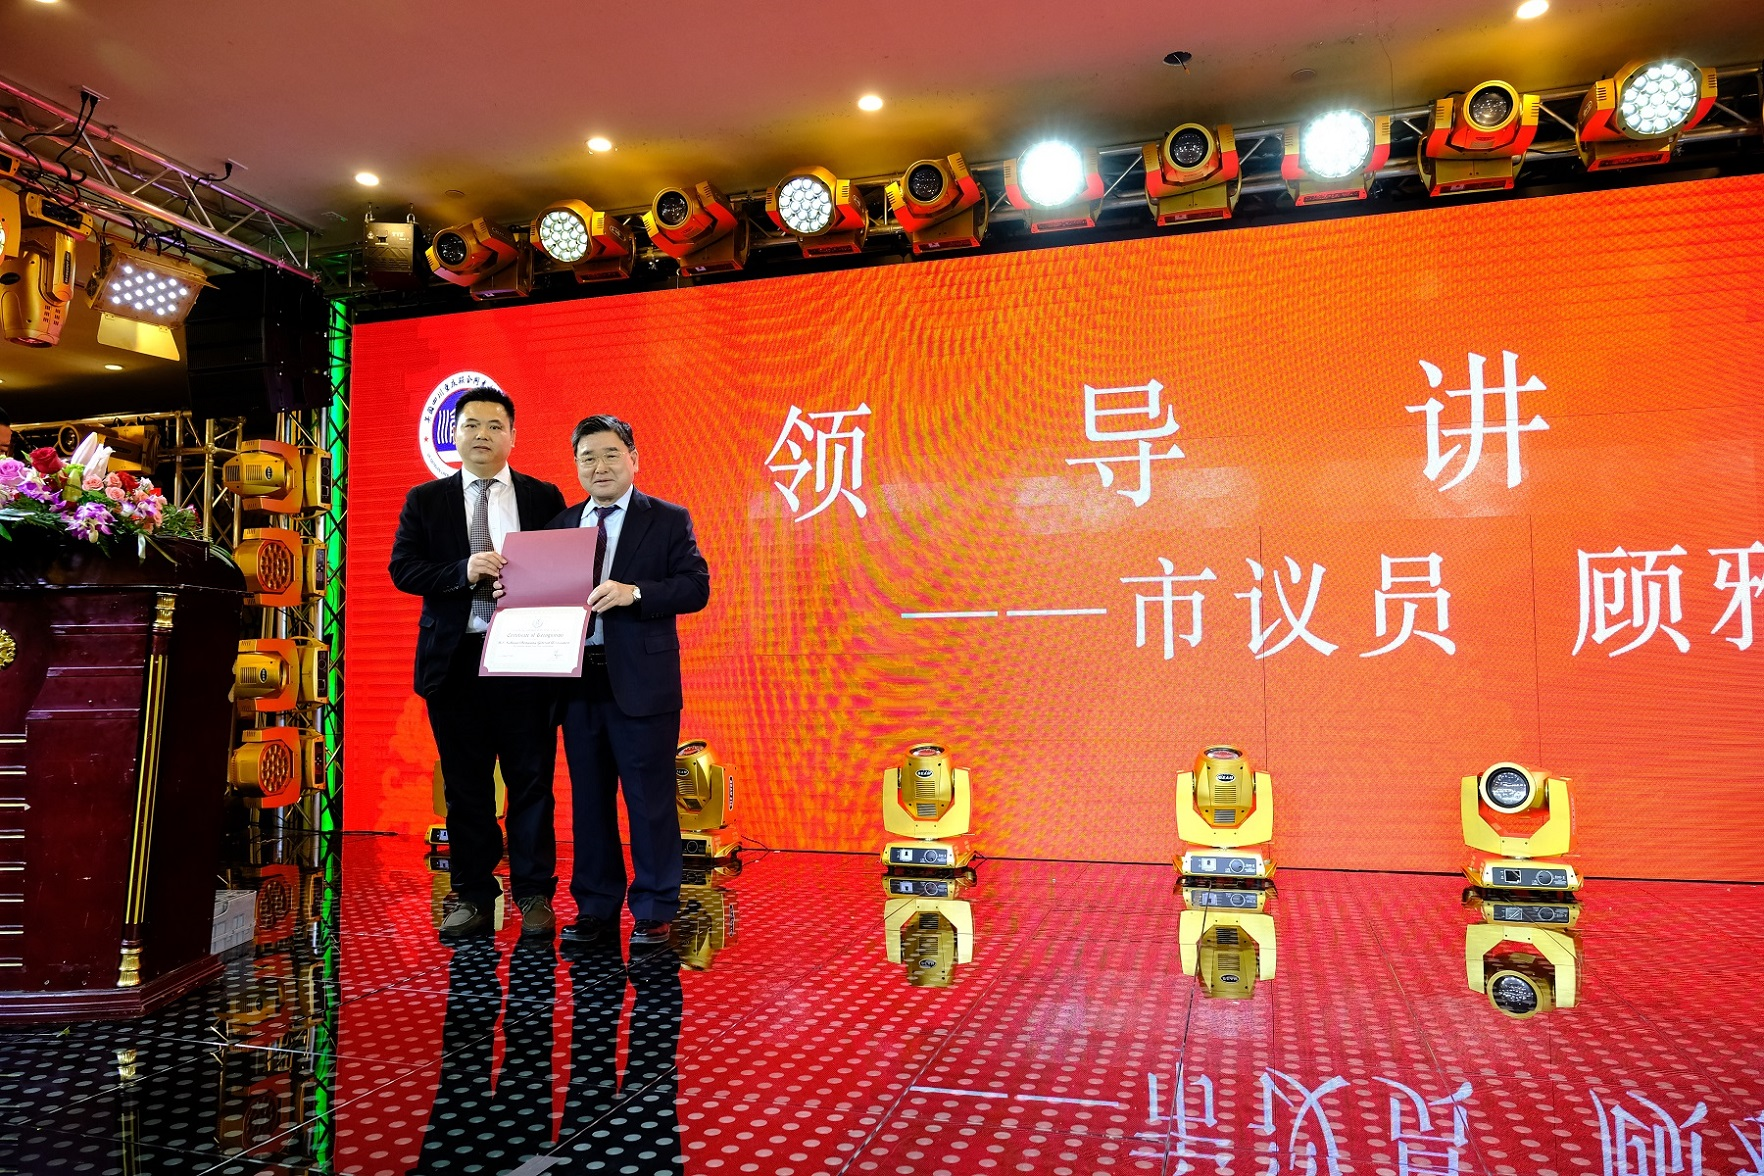 WeChat Image 20180207154734